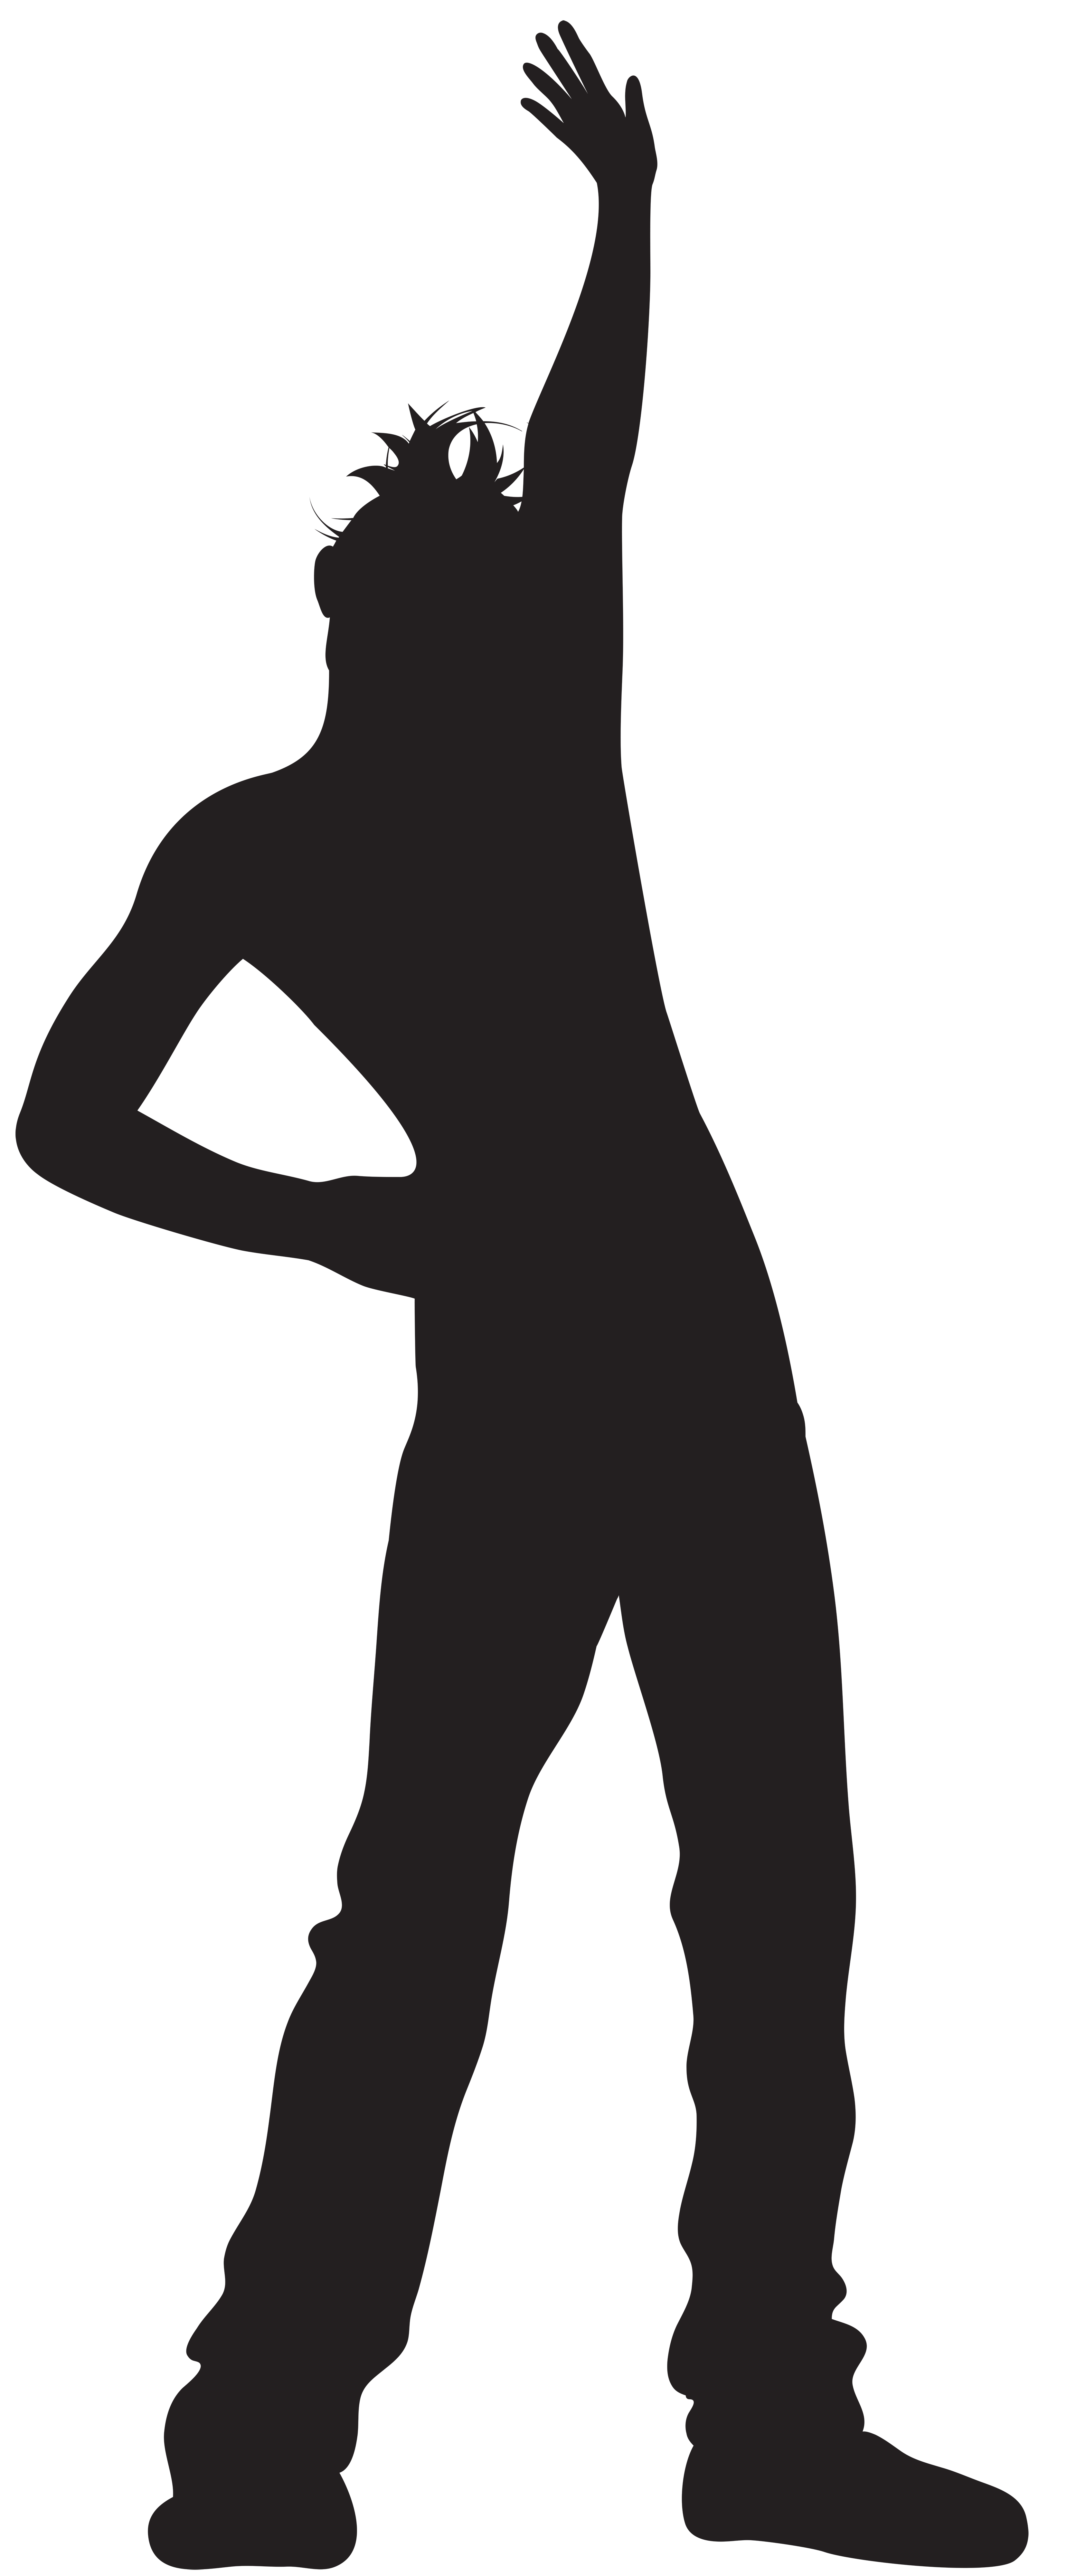 3314x8000 Dancing Man Silhouette Png Transparent Clip Art Imageu200b Gallery